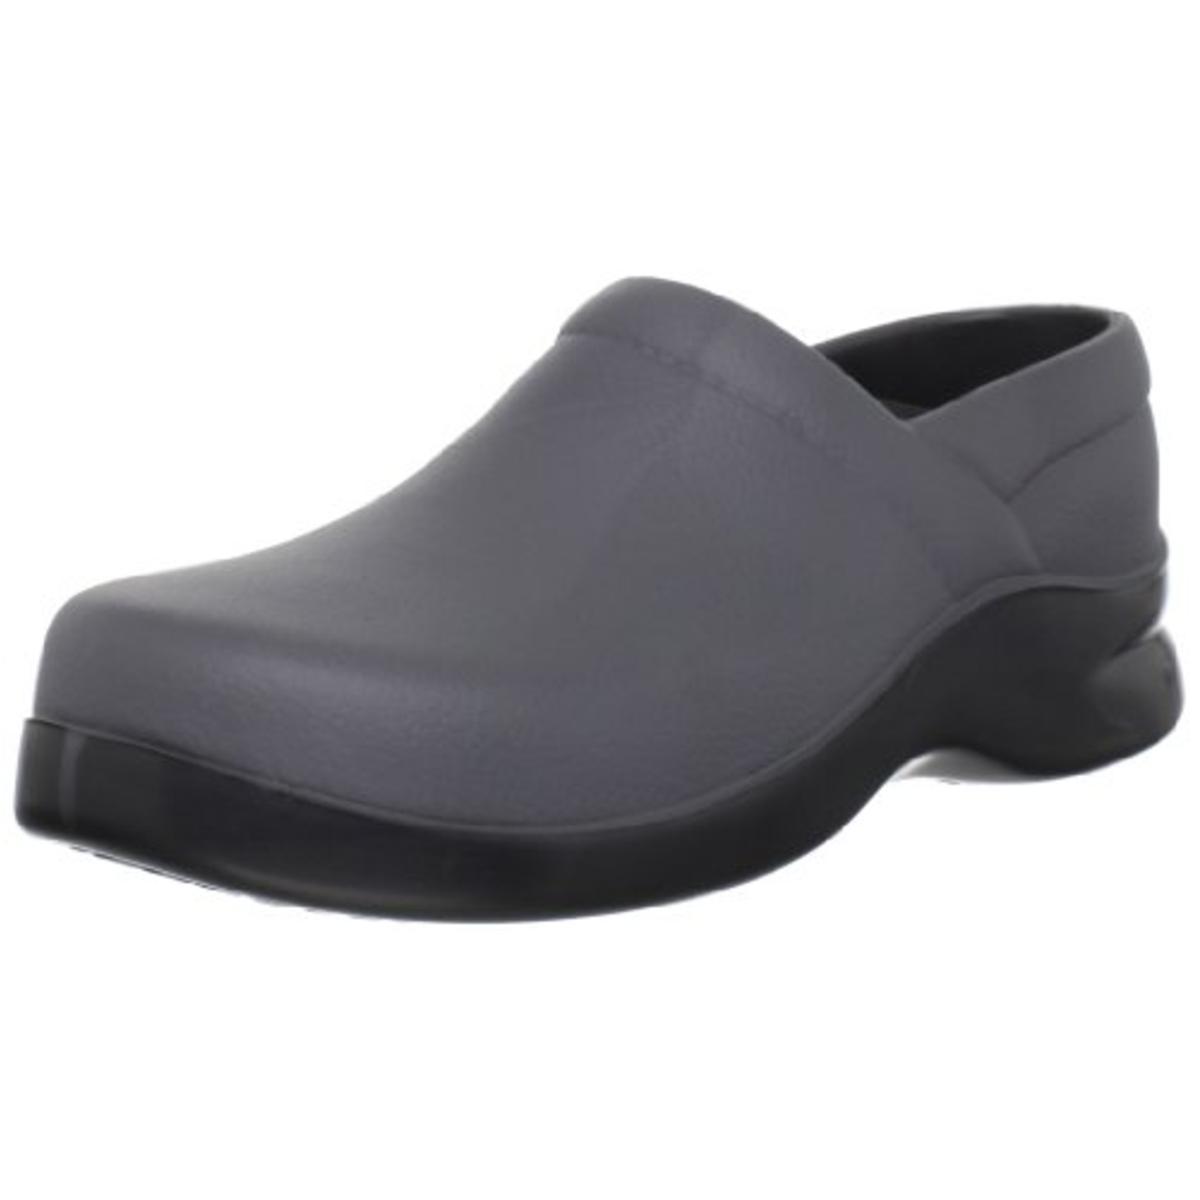 Dansko Shoes Orlando